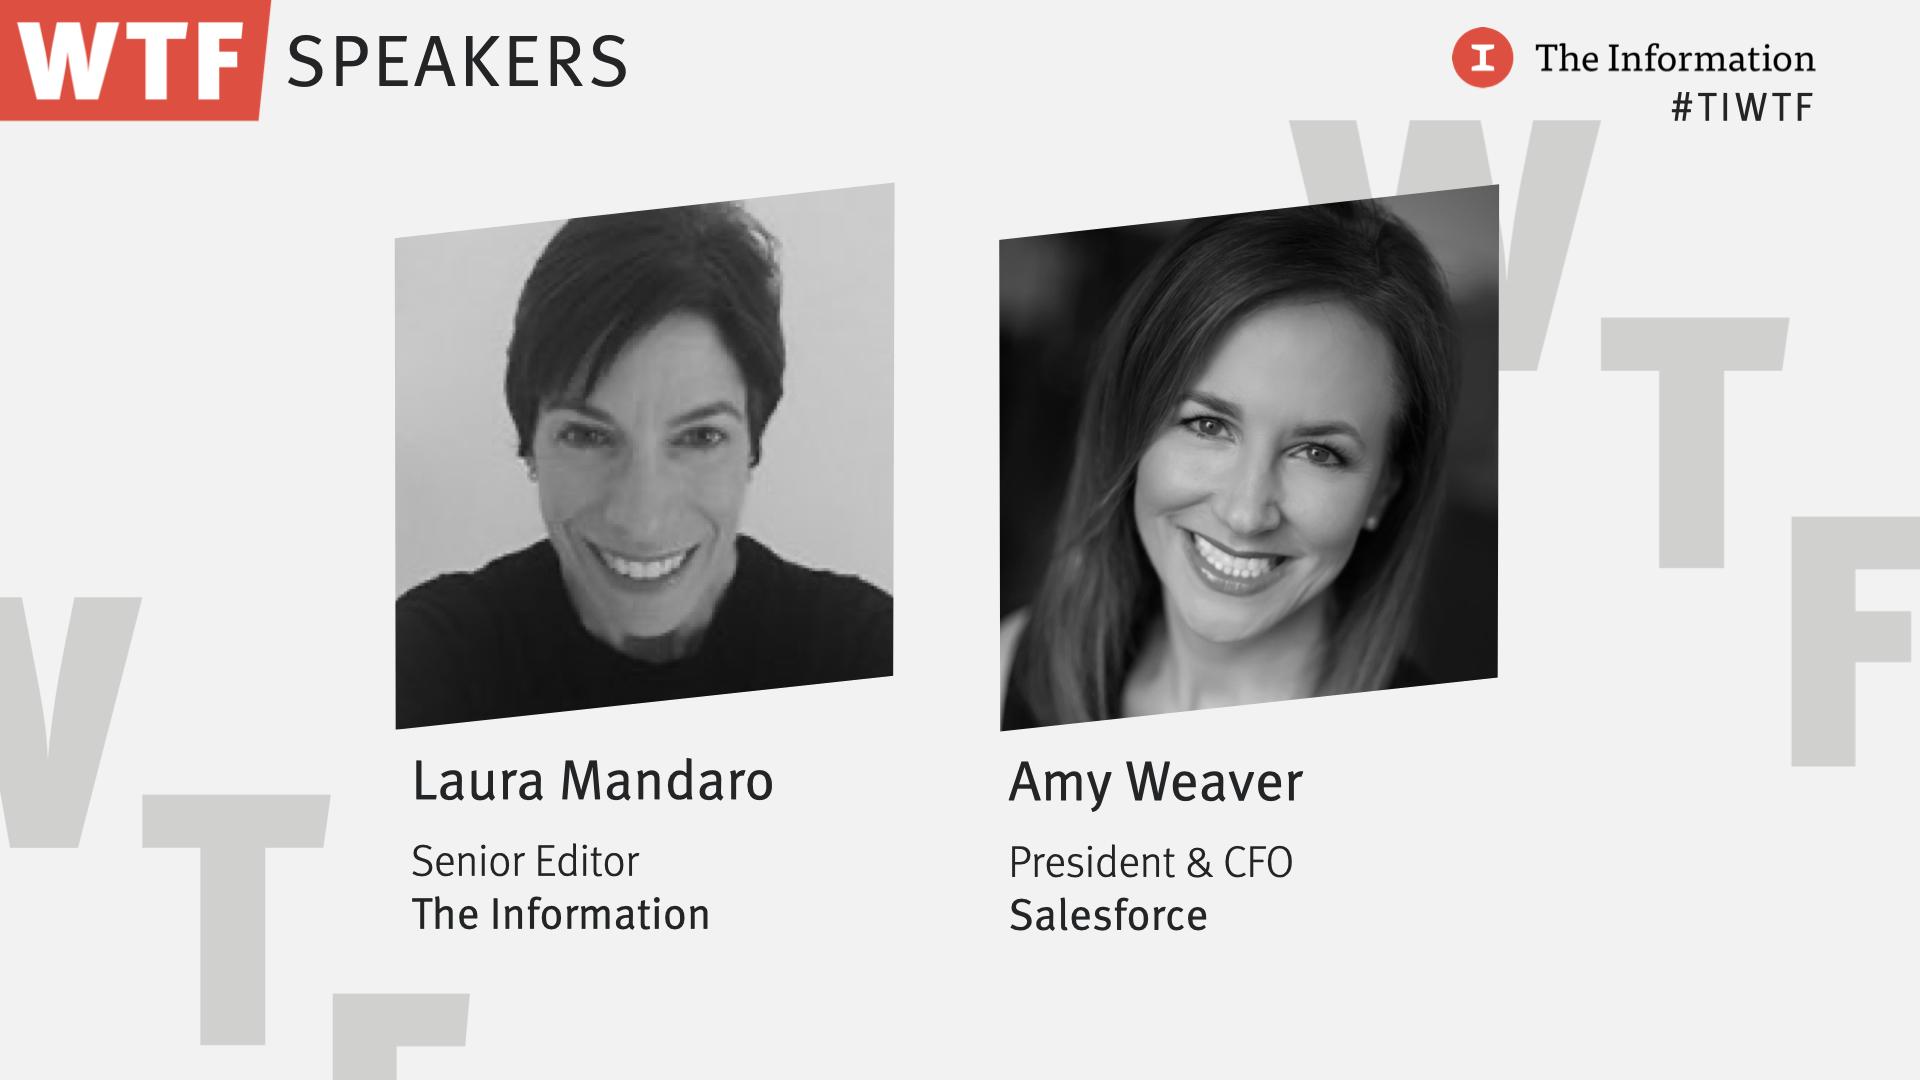 WTF 2021 - Amy Weaver, President & CFO, Salesforce in conversation with Laura Mandaro, Senior Editor, The Information